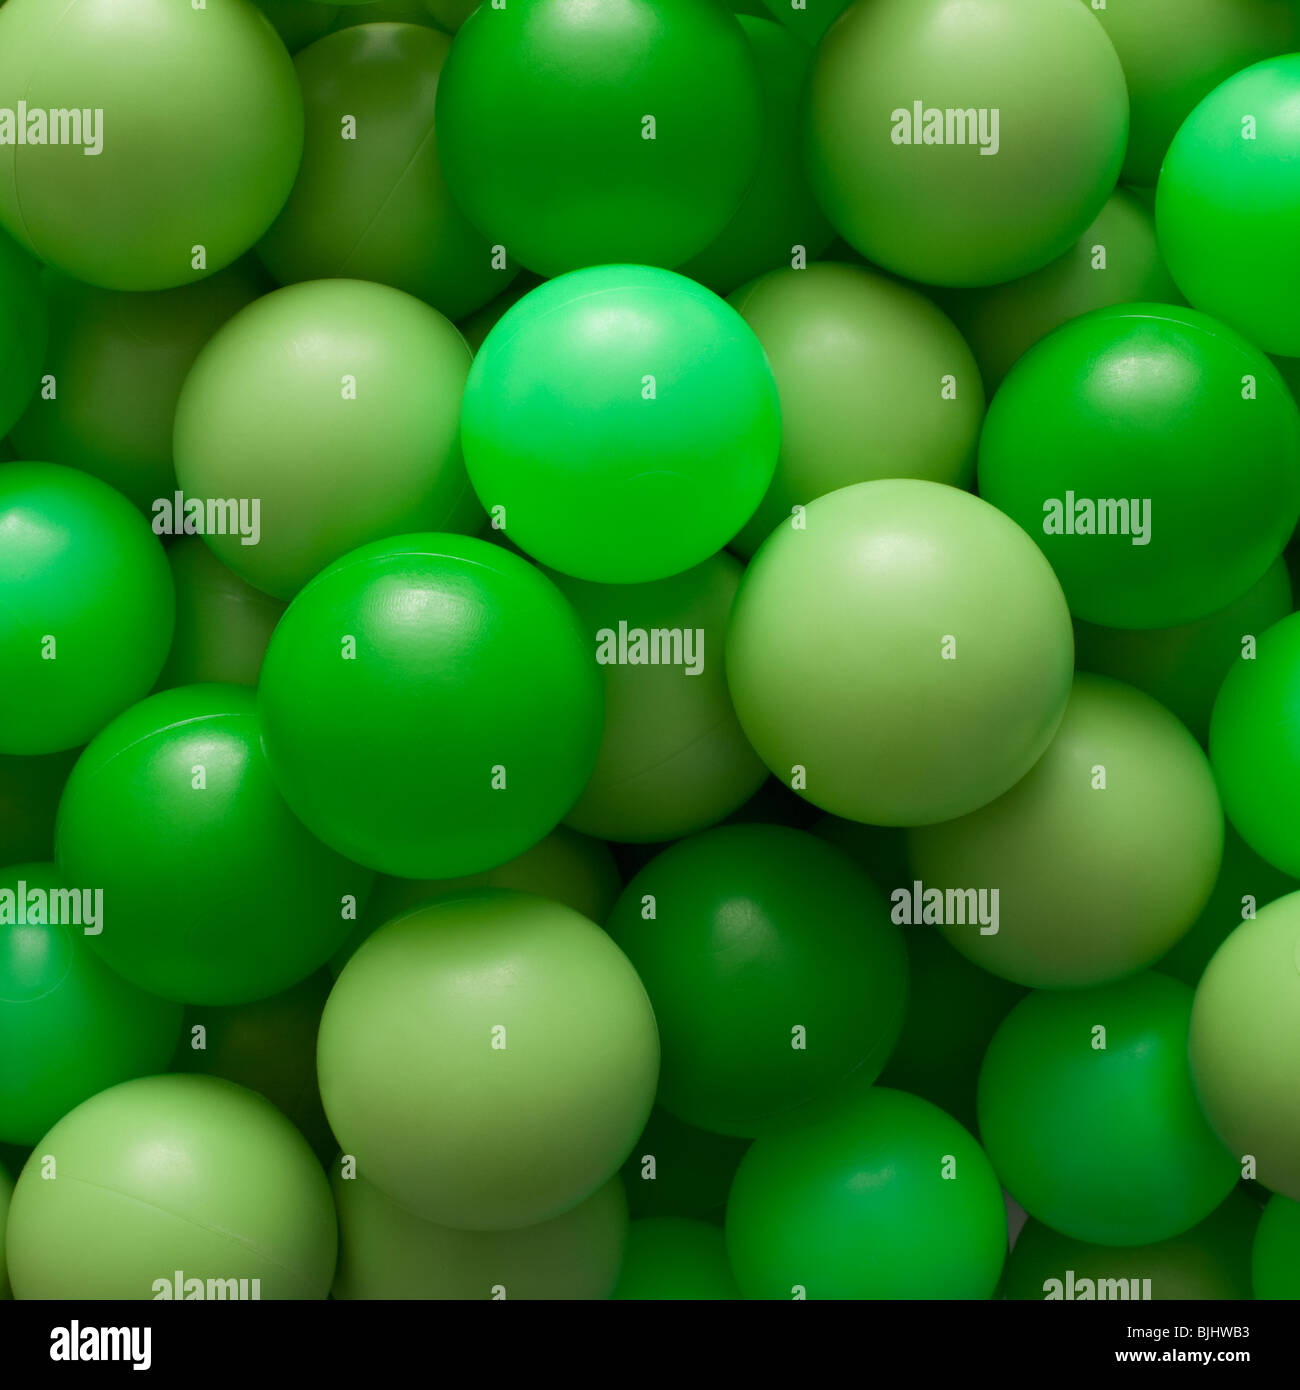 Bolas de verde Imagen De Stock